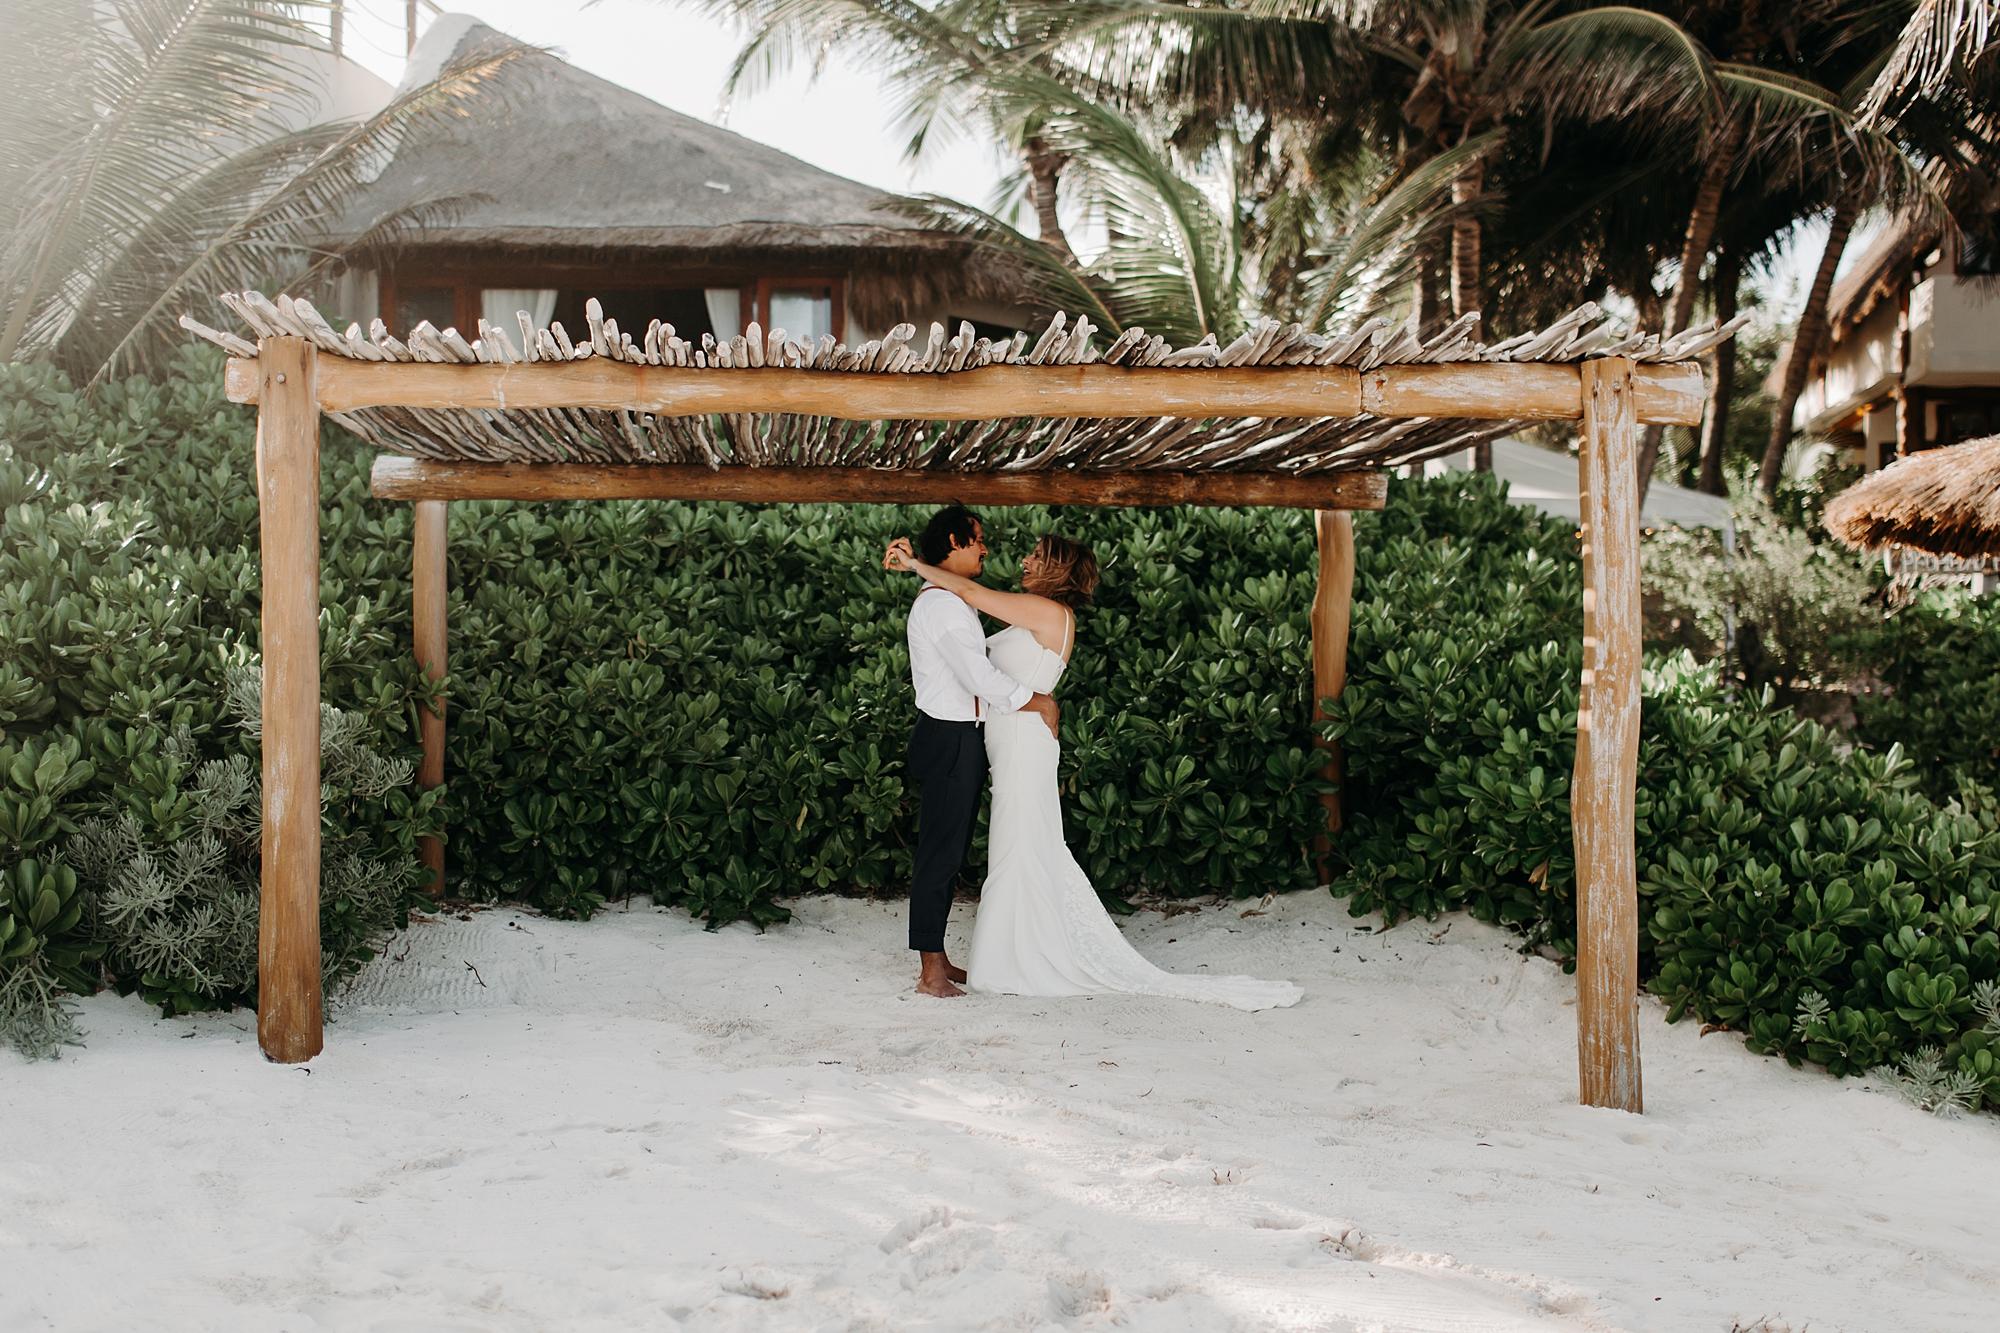 Danielle-San-Antonio-Wedding-Photographer-71_WEB.jpg